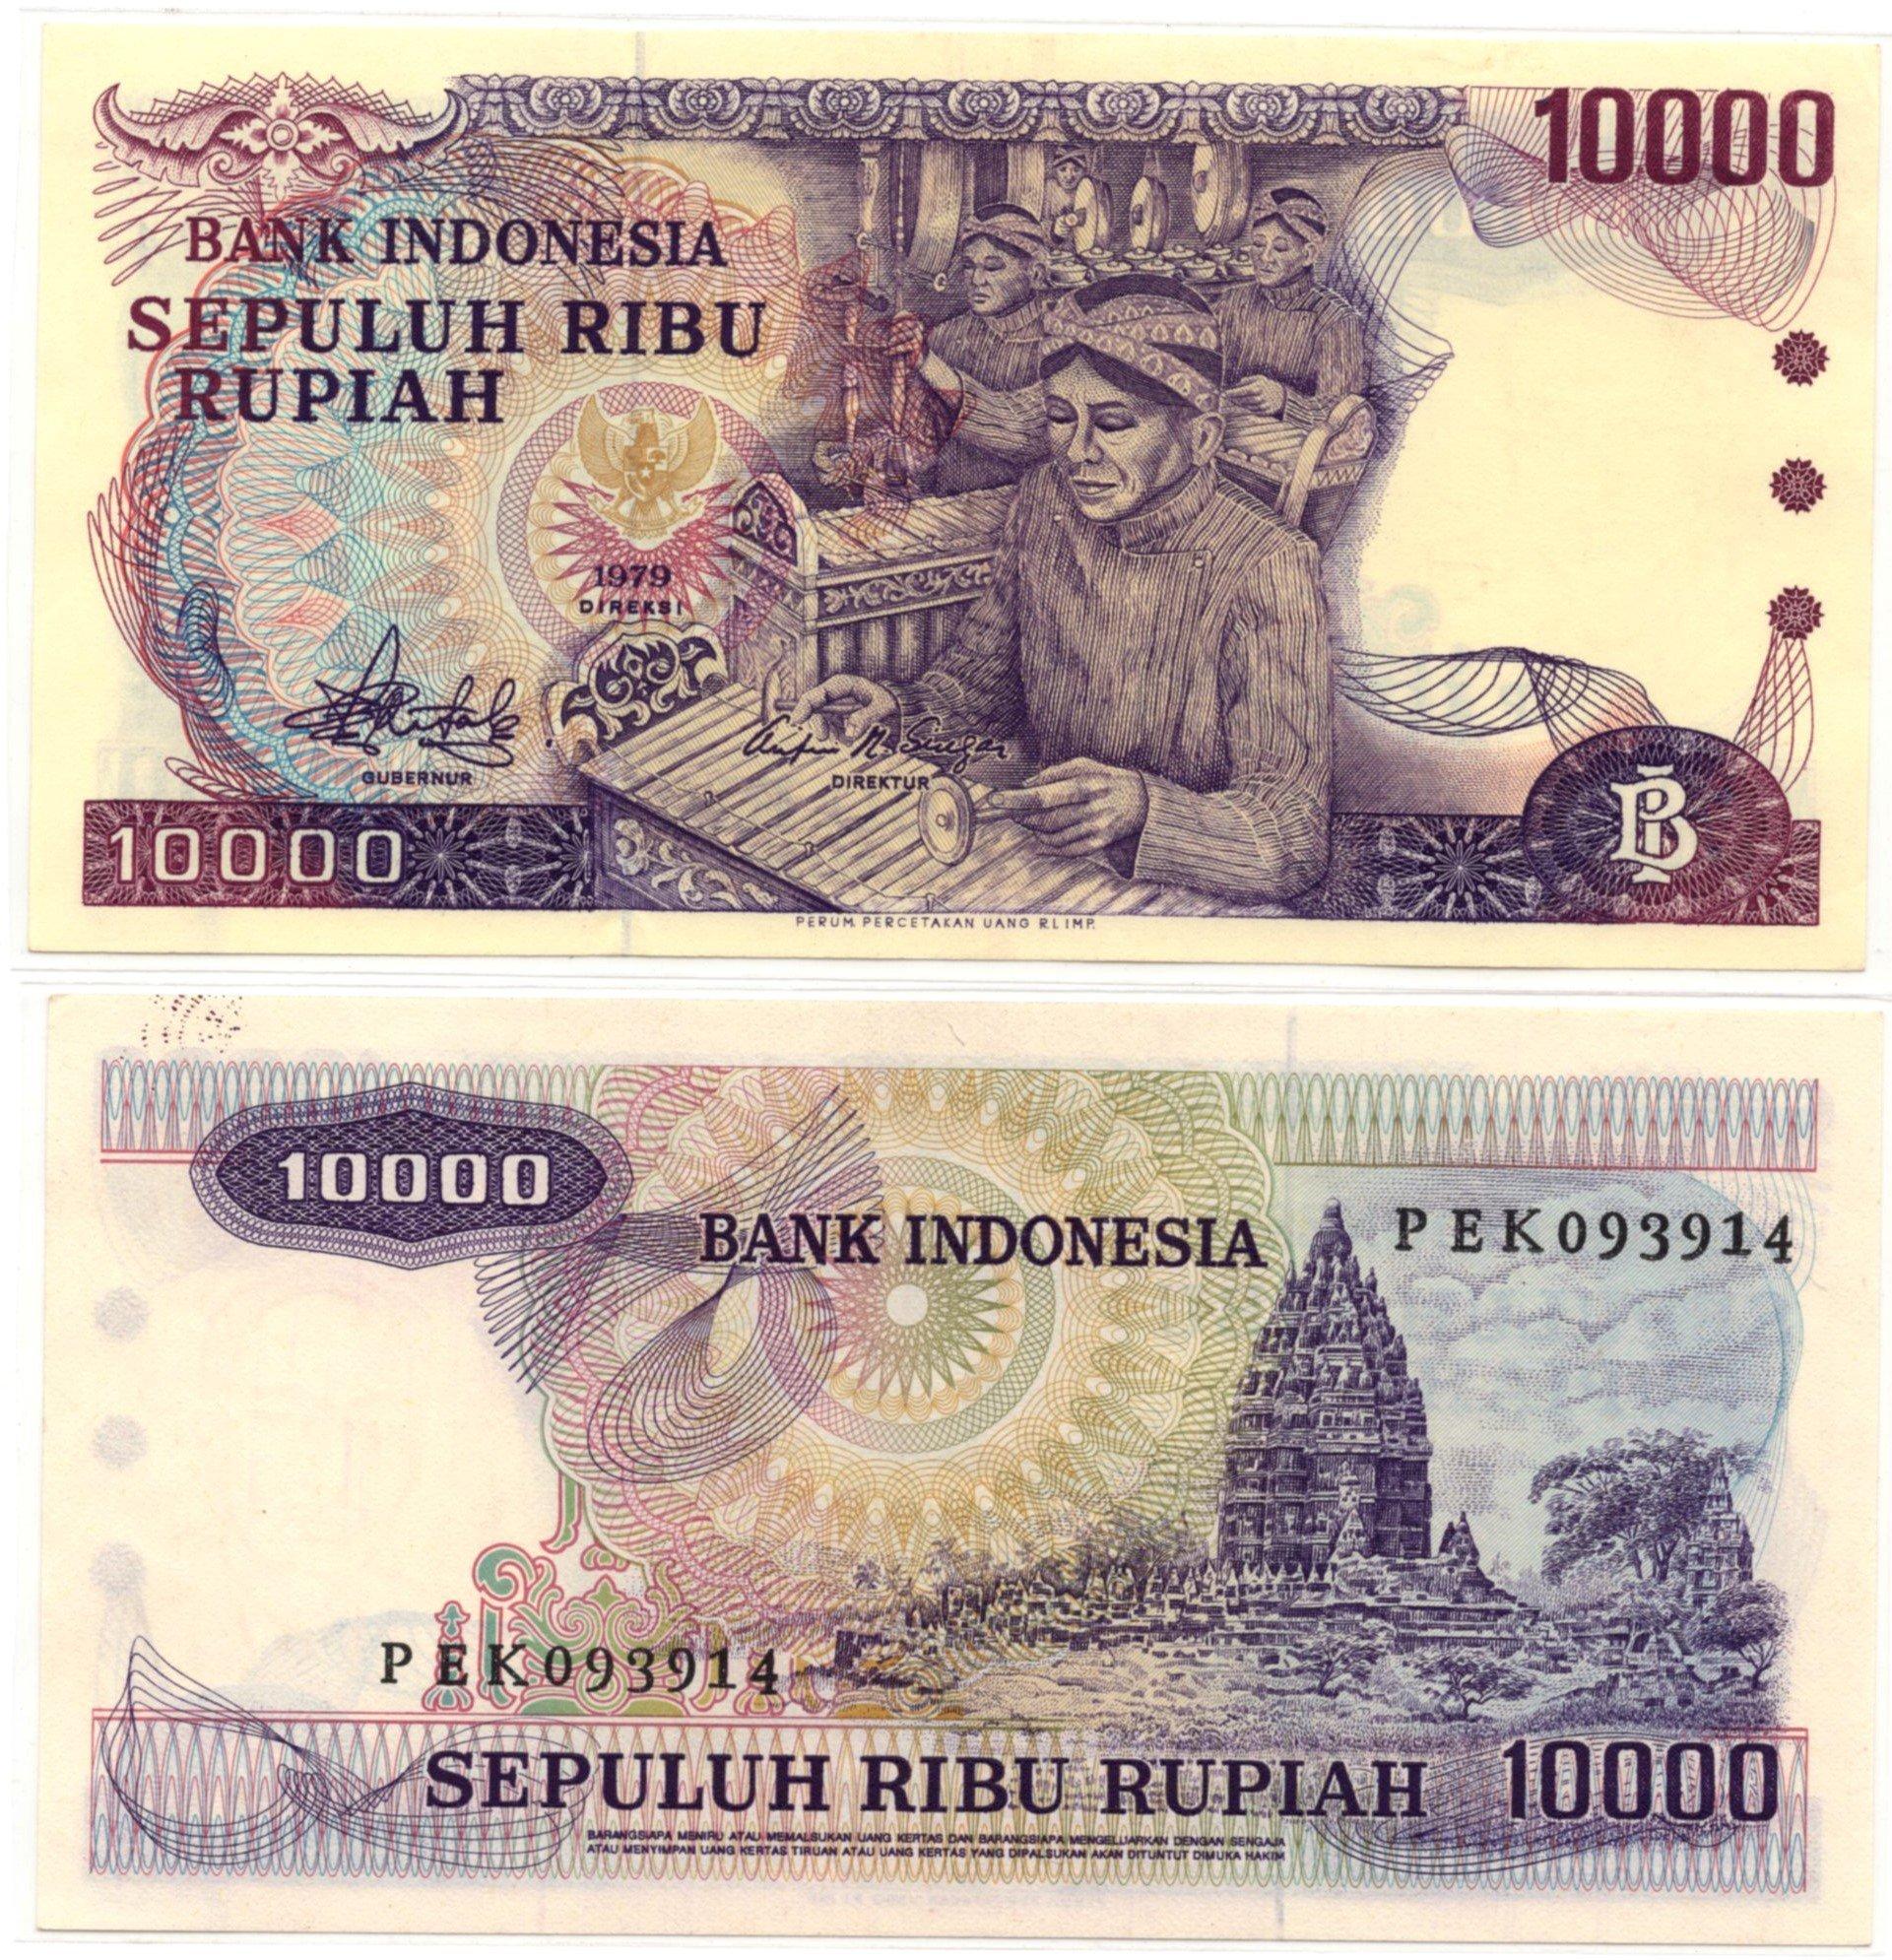 indonesia 10000 rupiah 1979